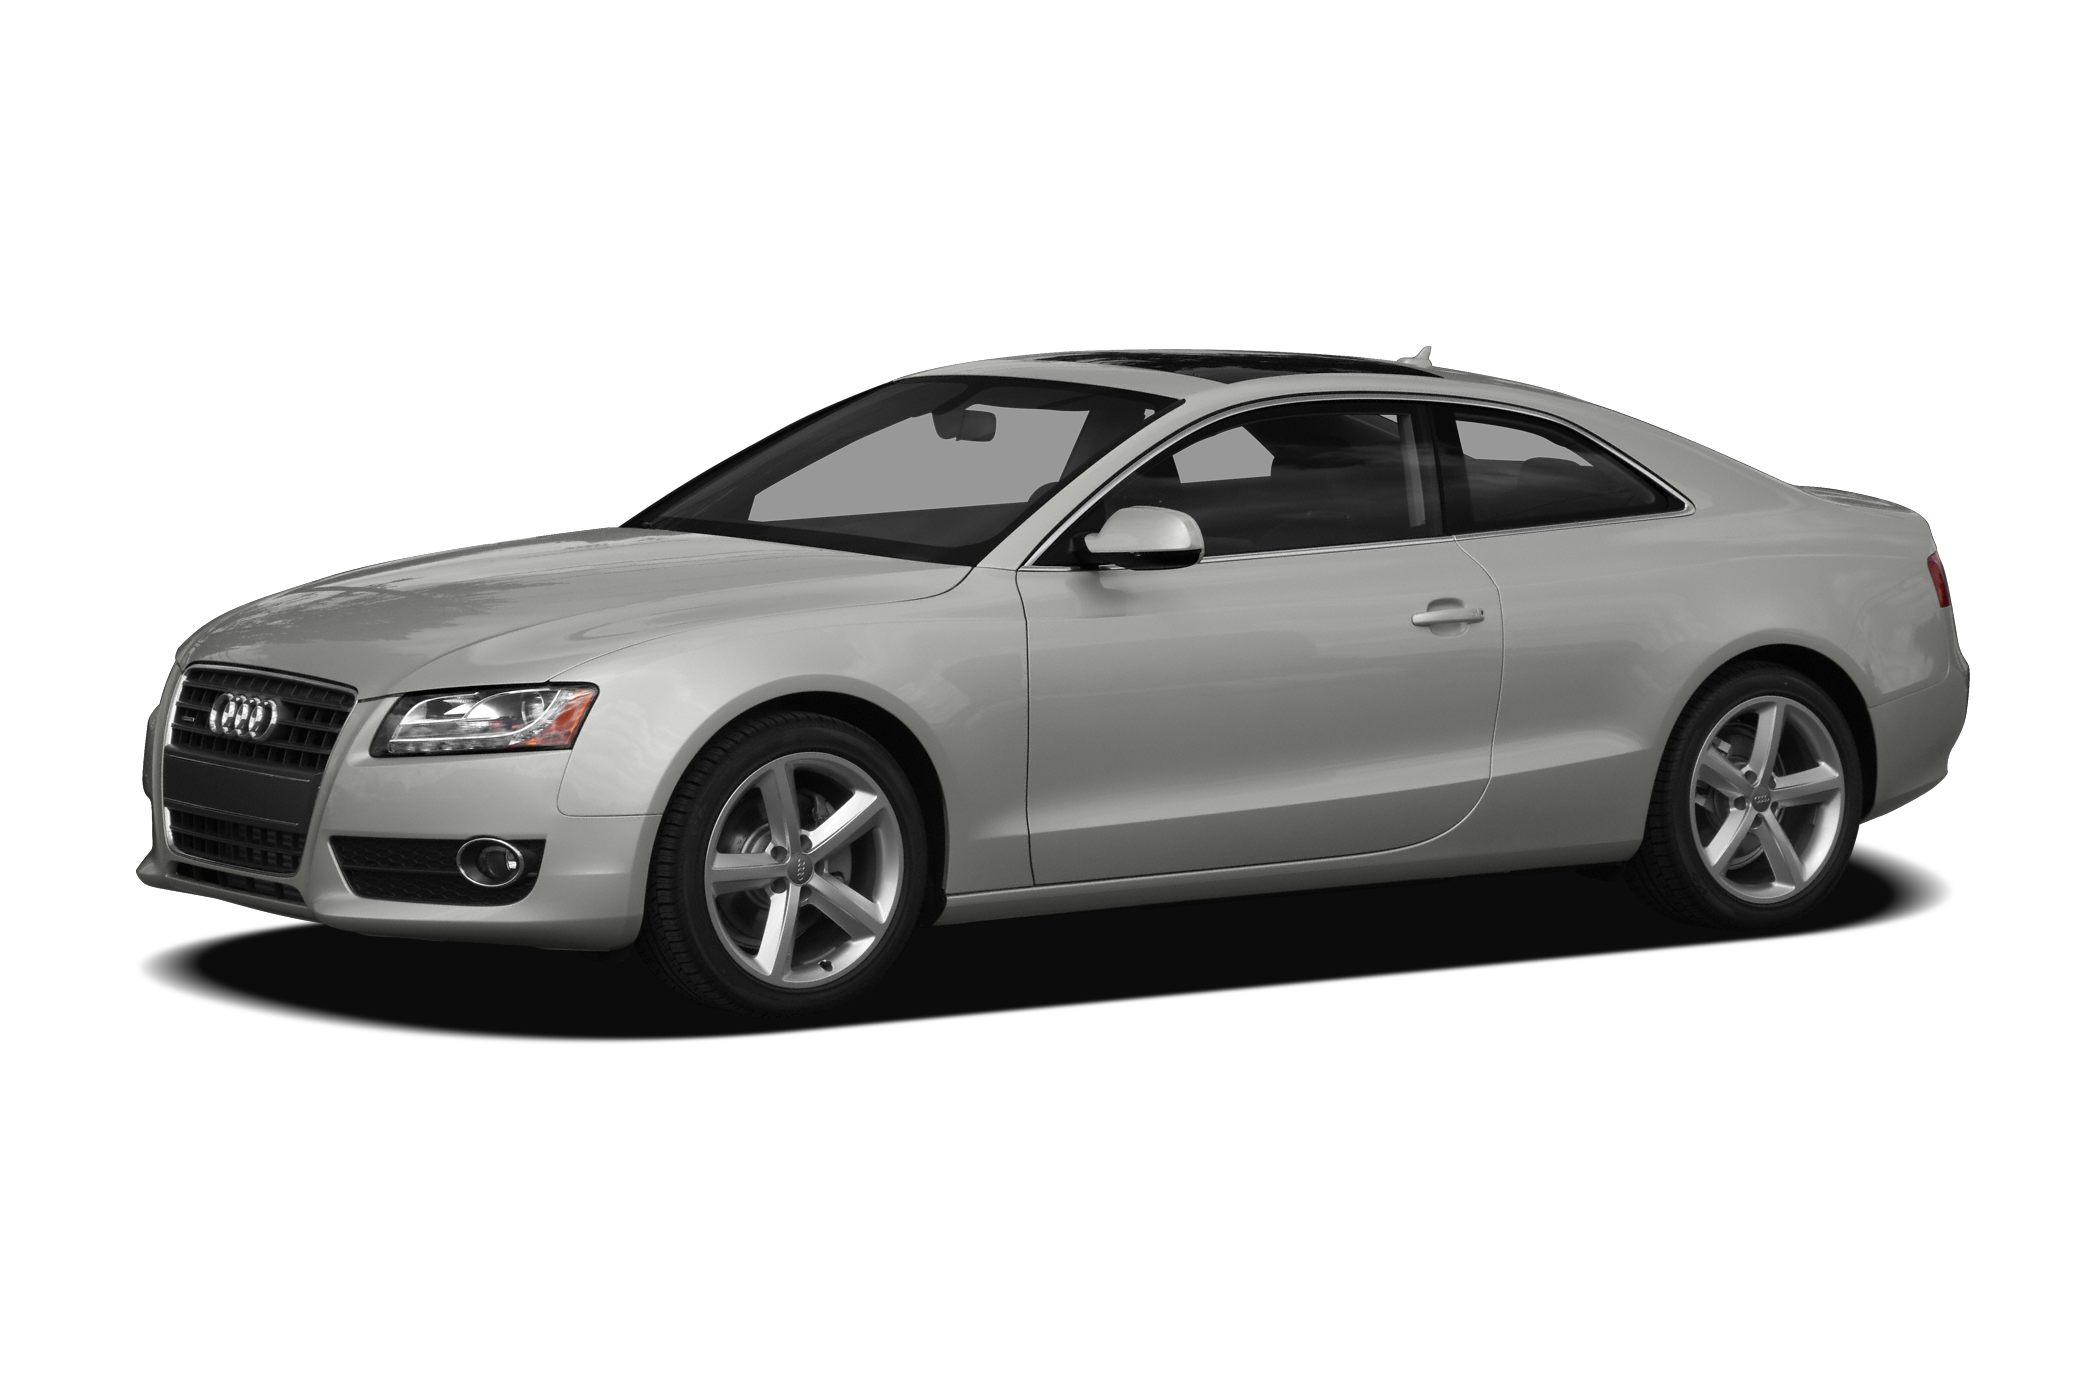 2011 Audi A5 20T quattro Premium Miles 75774Color Blue Pearl Stock 026376 VIN WAULFAFR6BA02